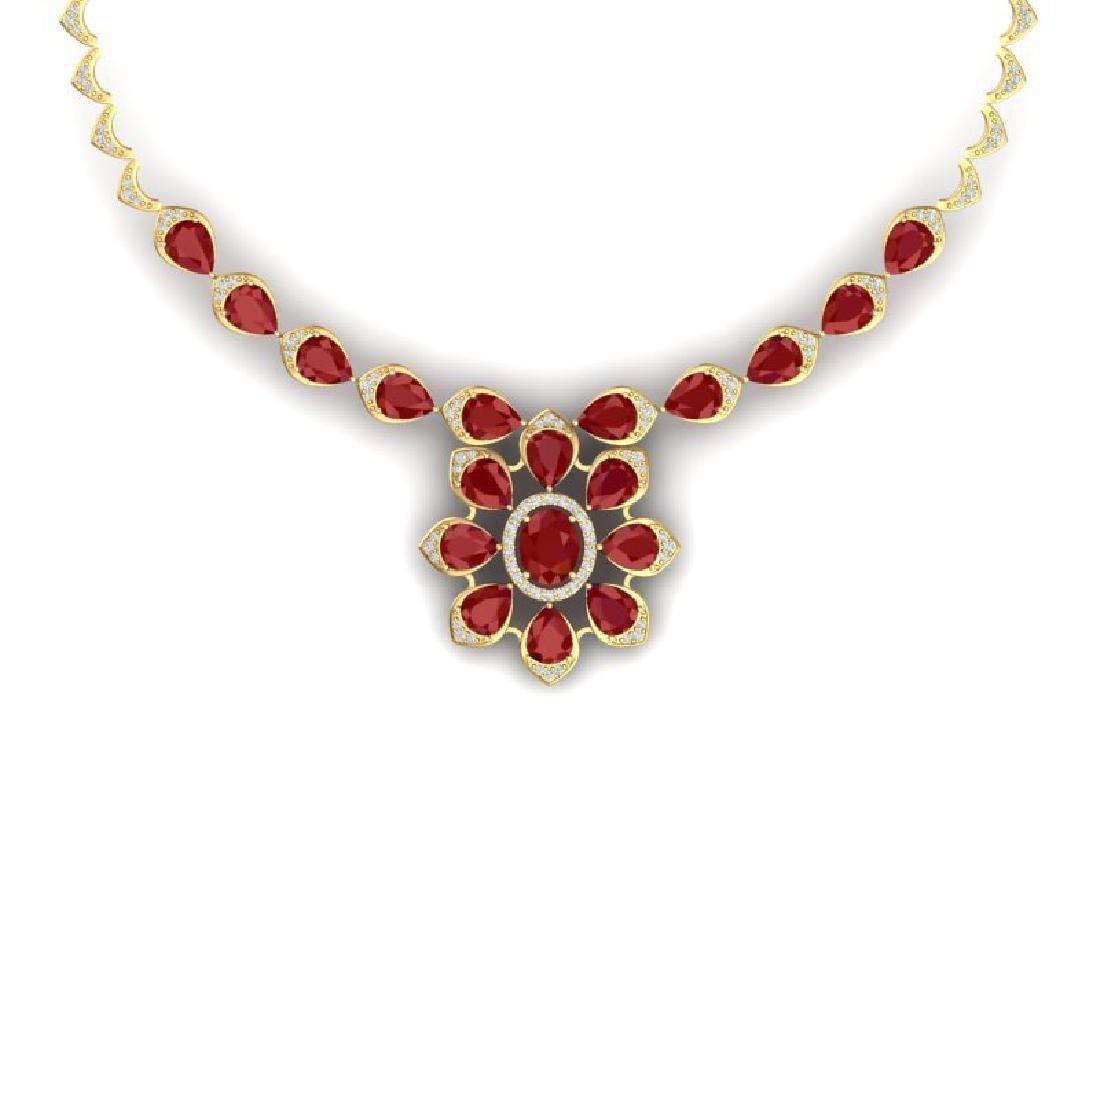 30.70 CTW Royalty Ruby & VS Diamond Necklace 18K Yellow